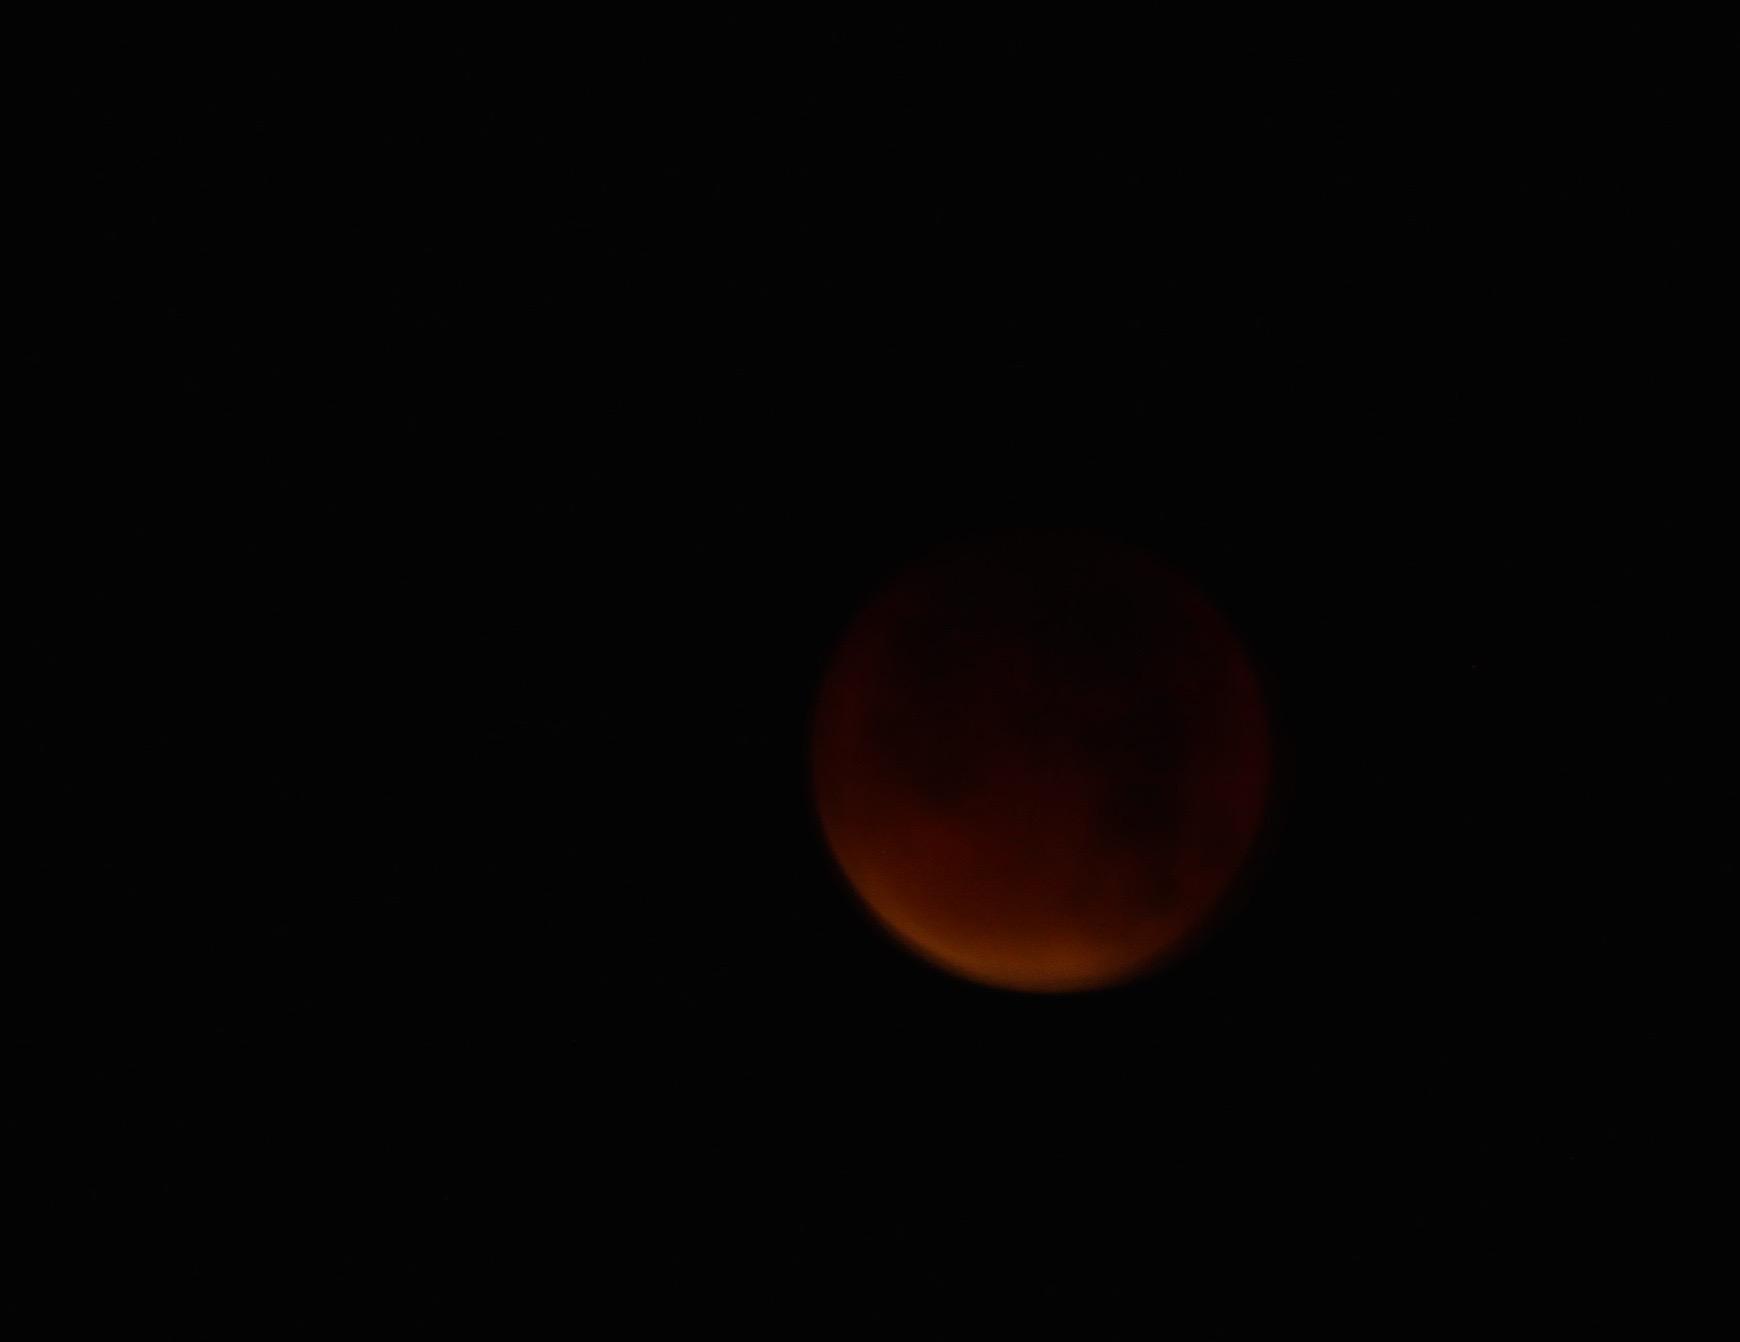 supermoon eclipse emma leafe 2015_red.jpg